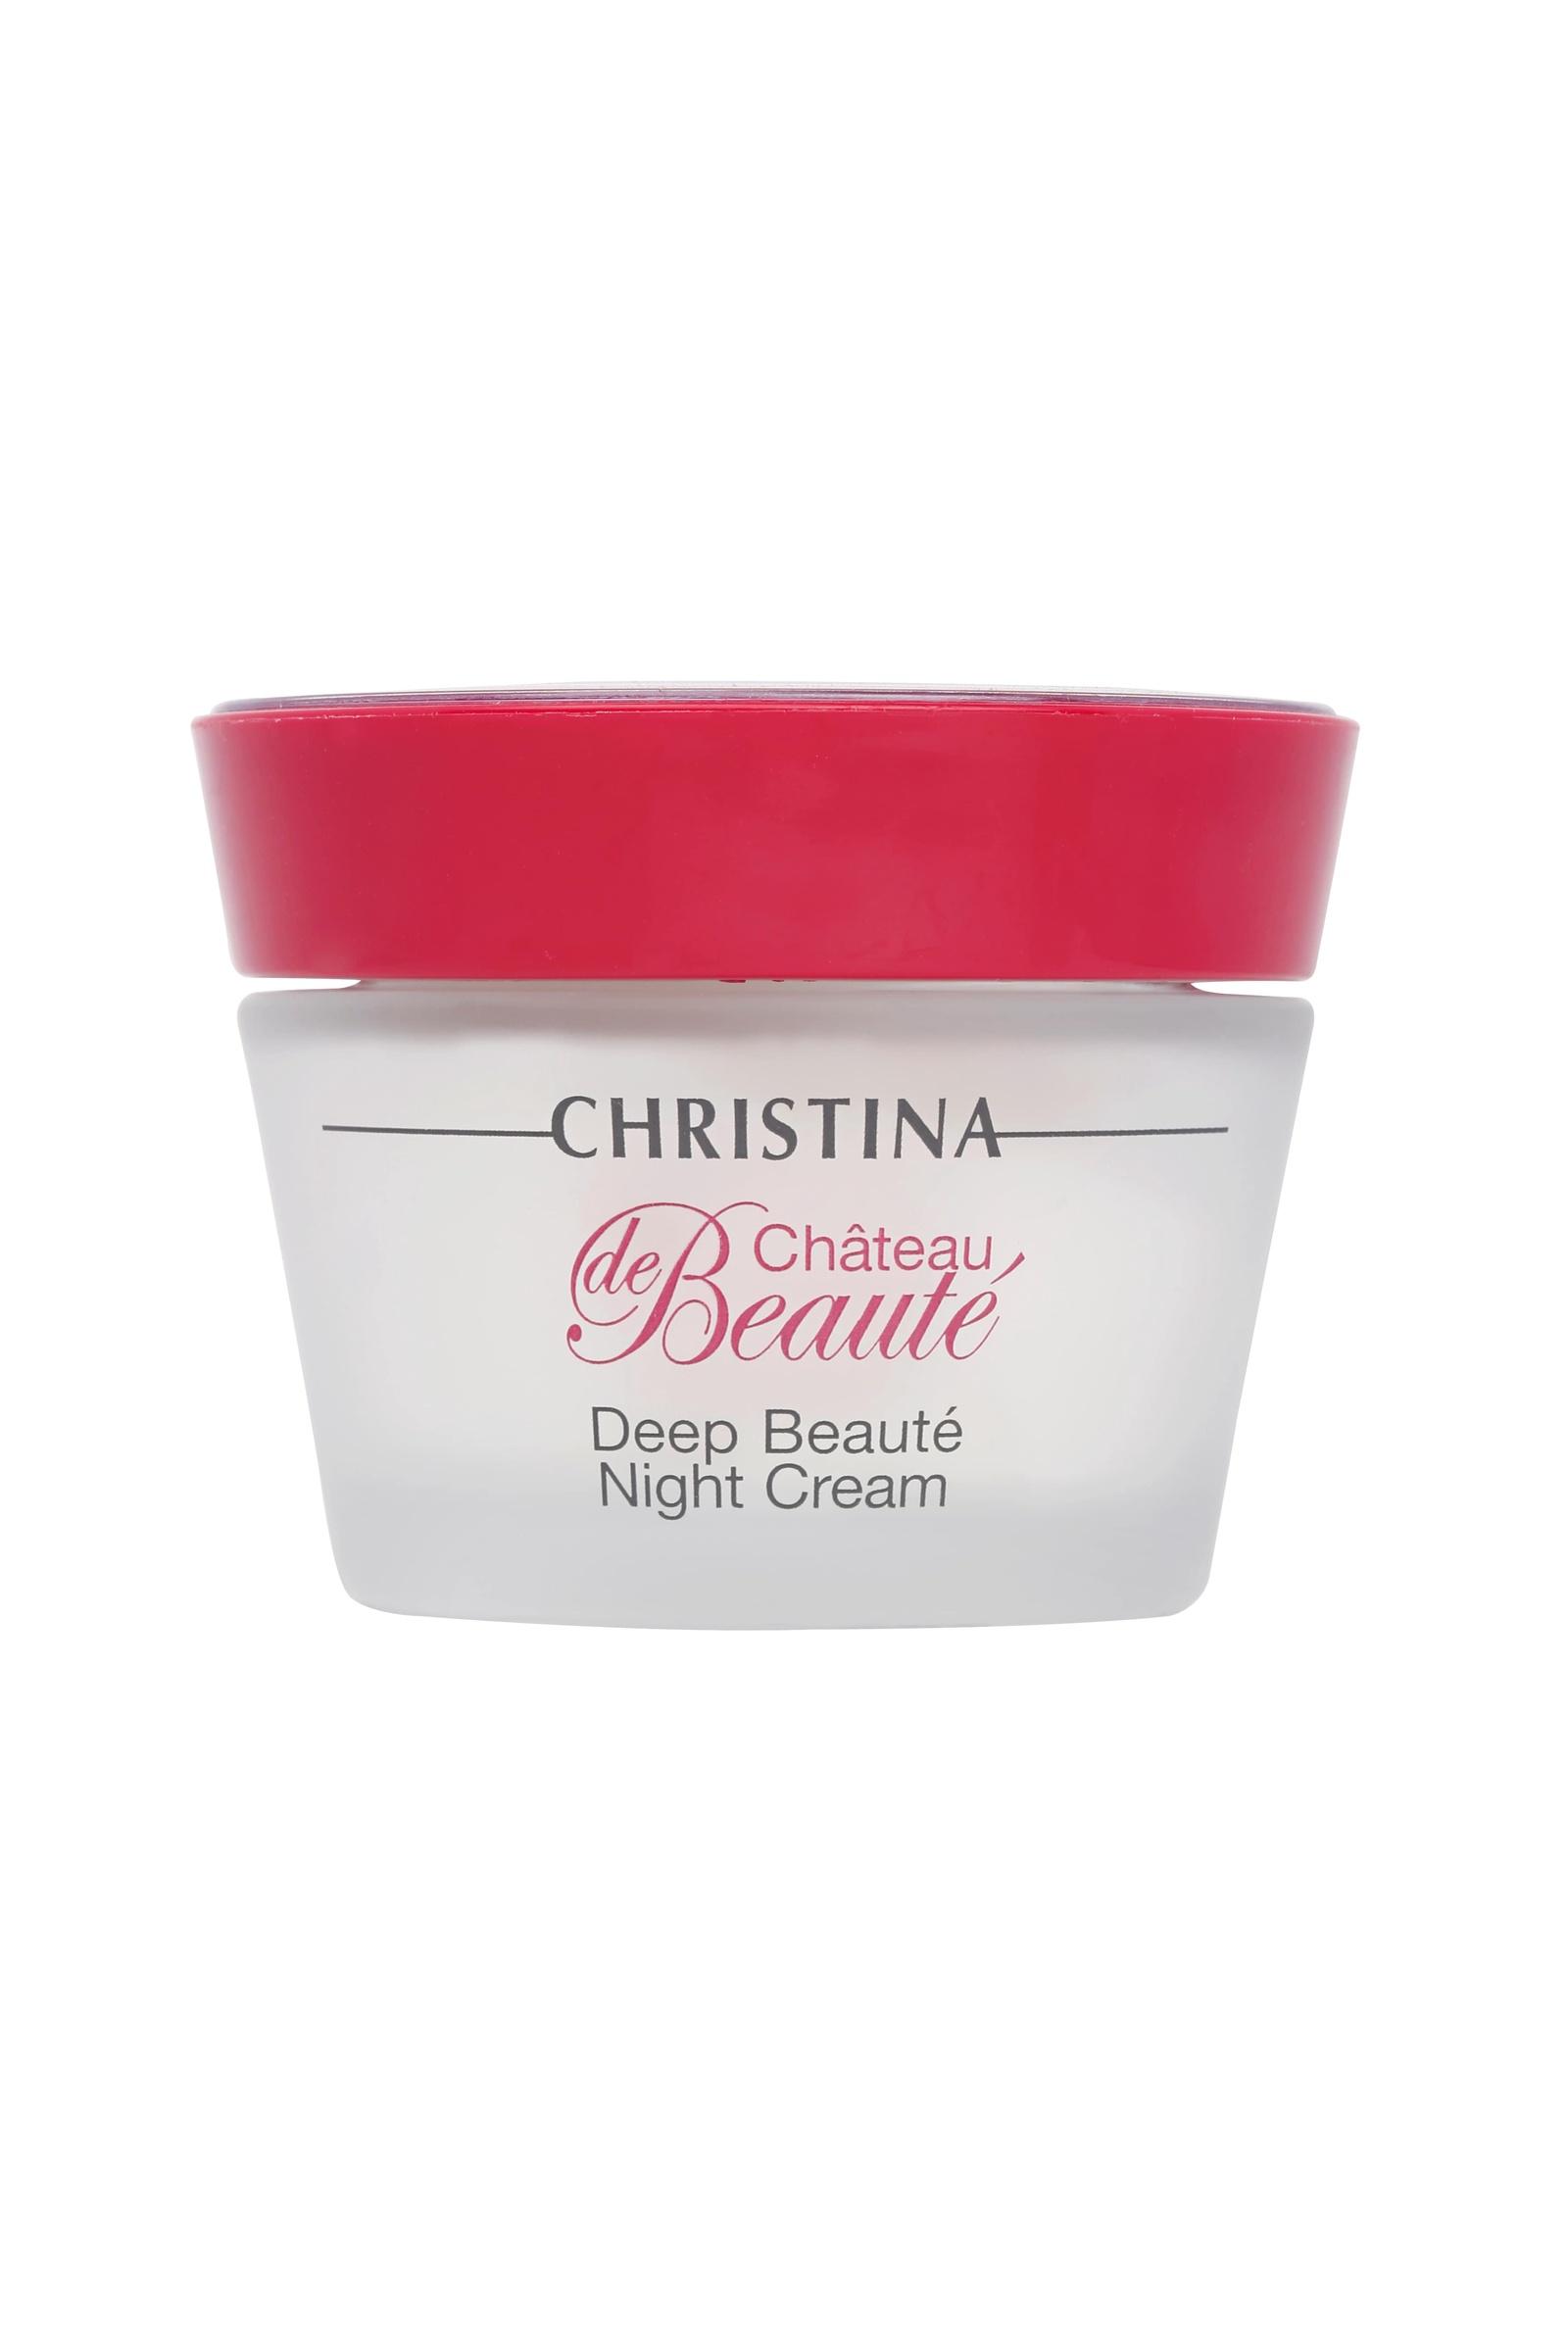 Крем для ухода за кожей CHRISTINA CHR486 крем для ухода за кожей christina очищающий silk cleanup